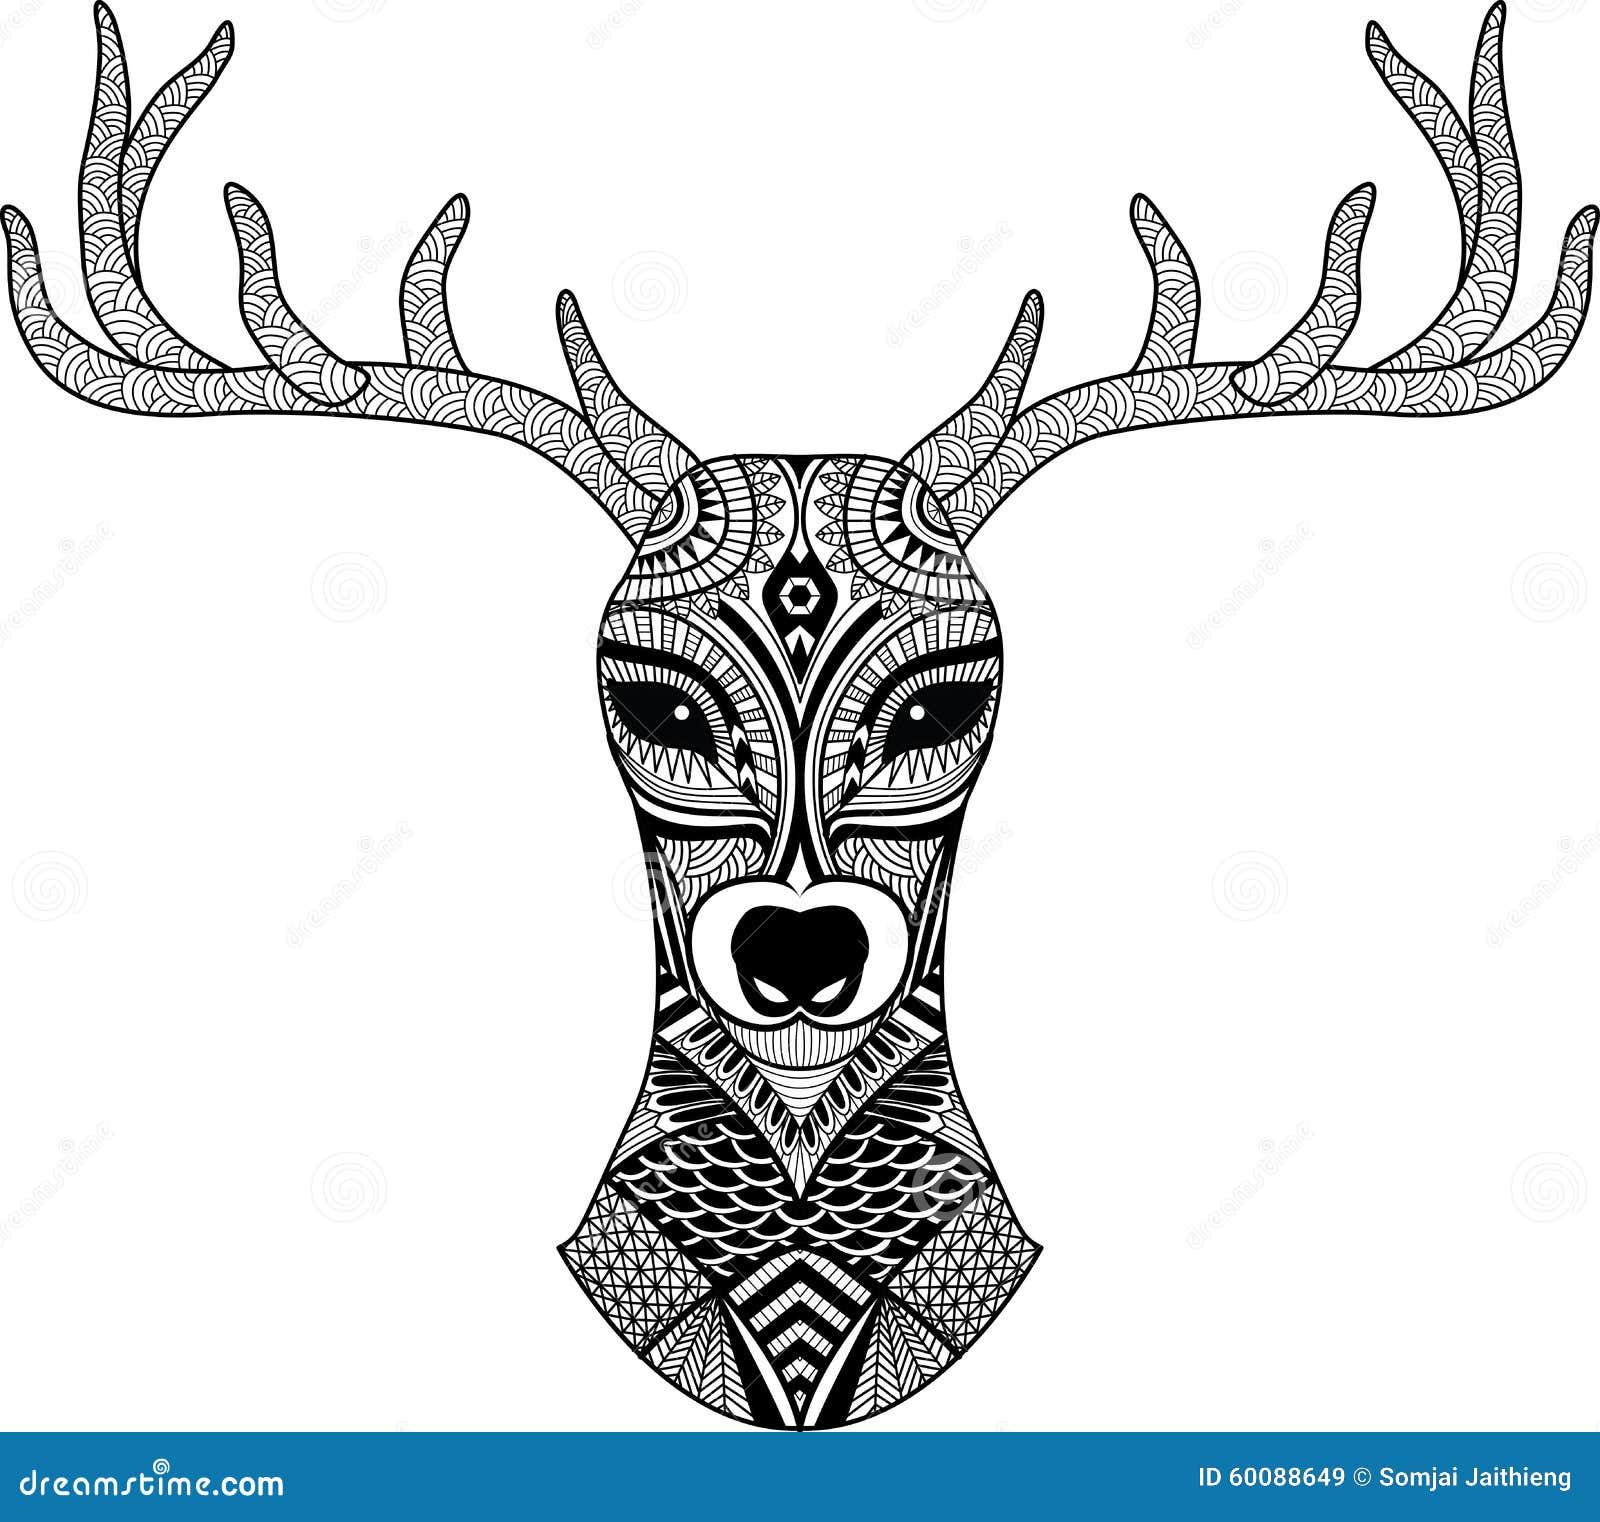 deer head stylized in zentangle style tribal tattoo design vector stock vector illustration. Black Bedroom Furniture Sets. Home Design Ideas